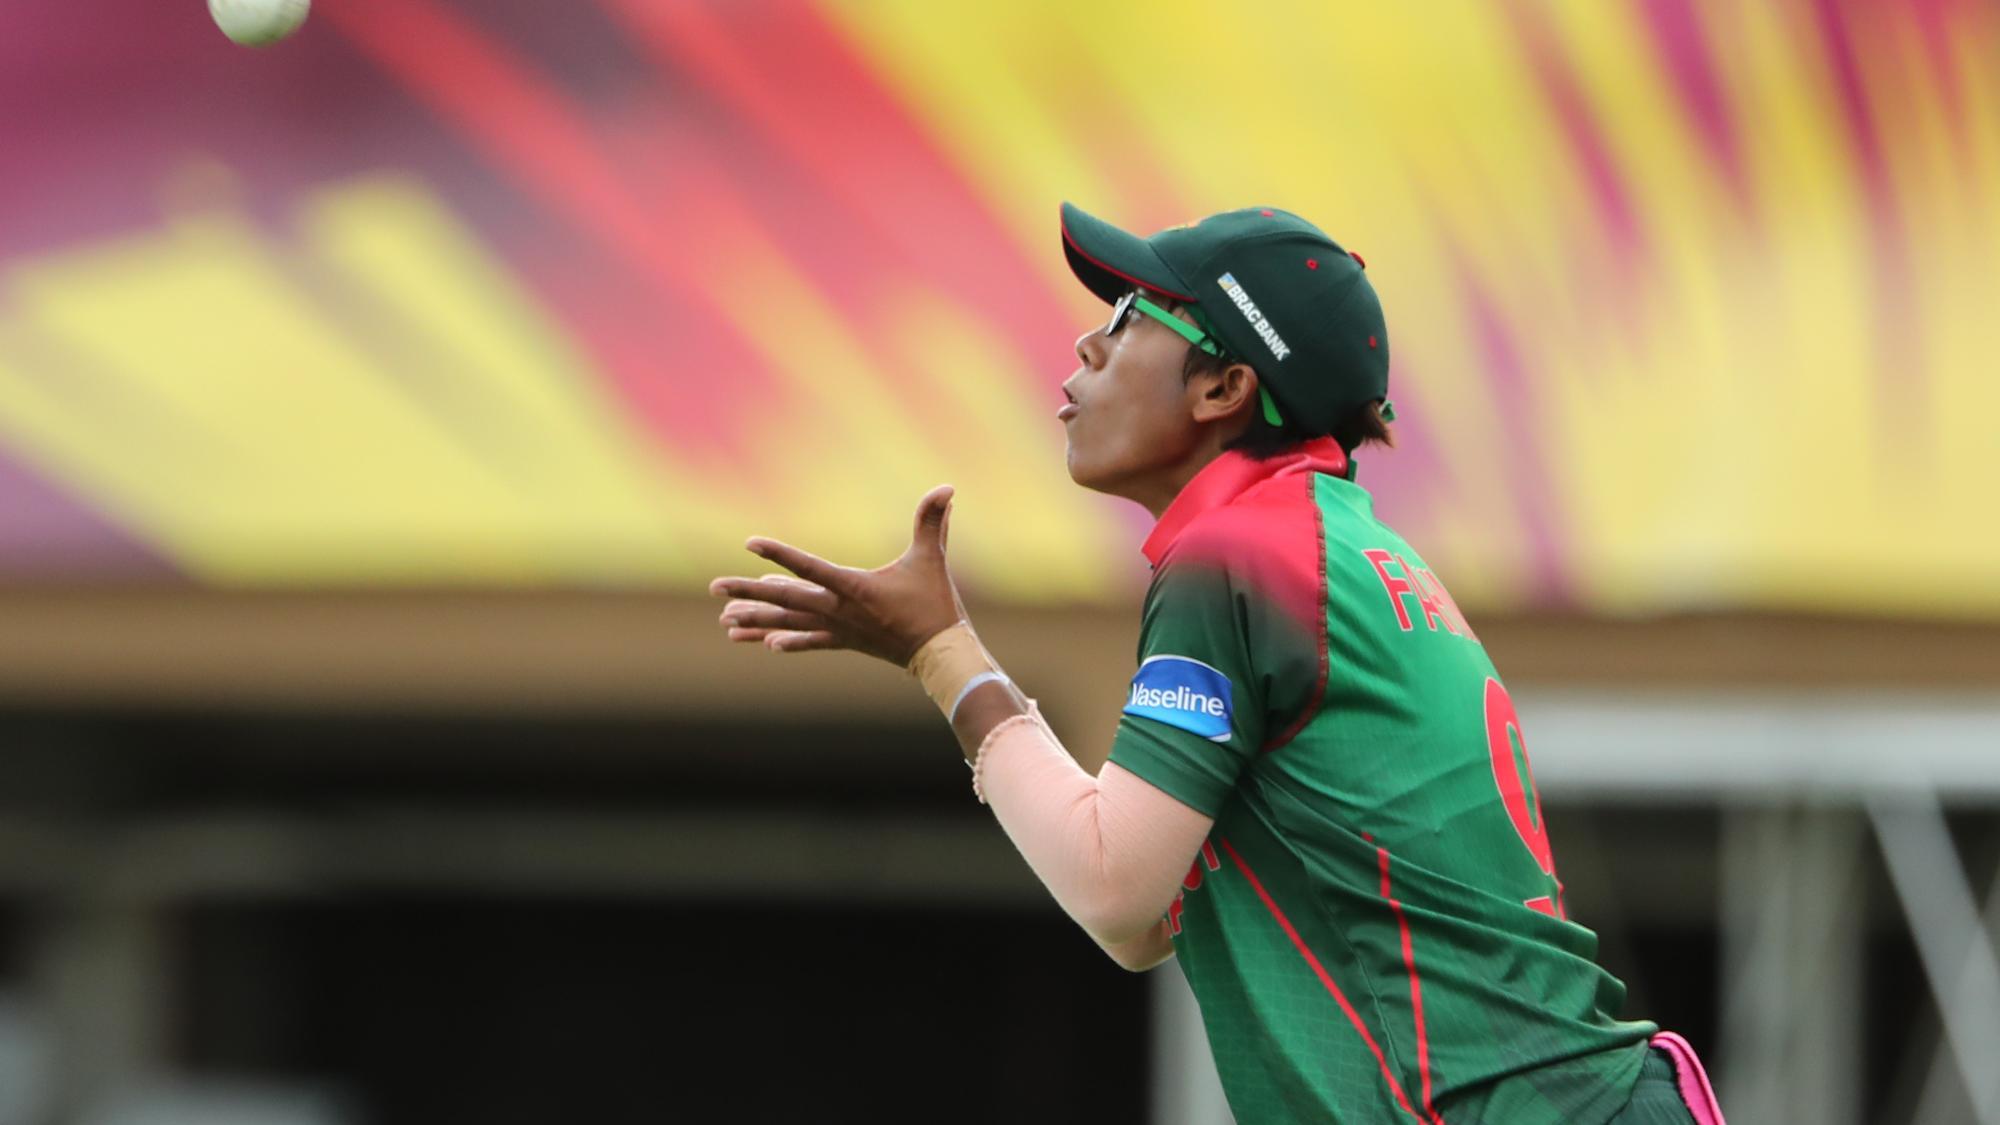 Fahima Khatun of Bangladesh settles under a catch during the ICC Women's World T20 warm up match between Bangladesh and Ireland on November 4, 2018 at the Guyana National Stadium in Providence, Guyana.